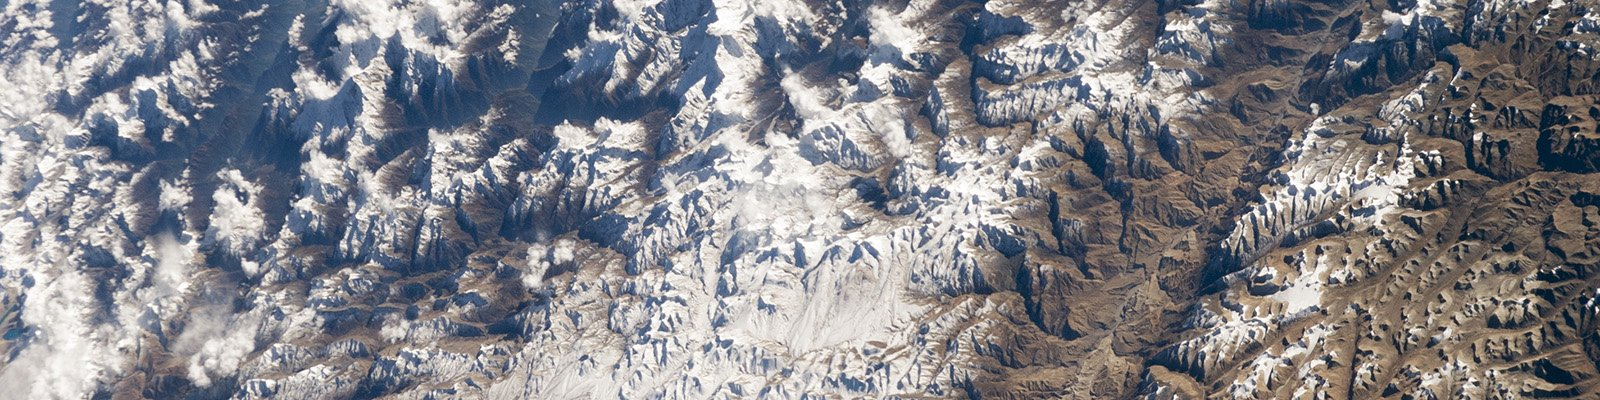 Annapurna and Manaslu